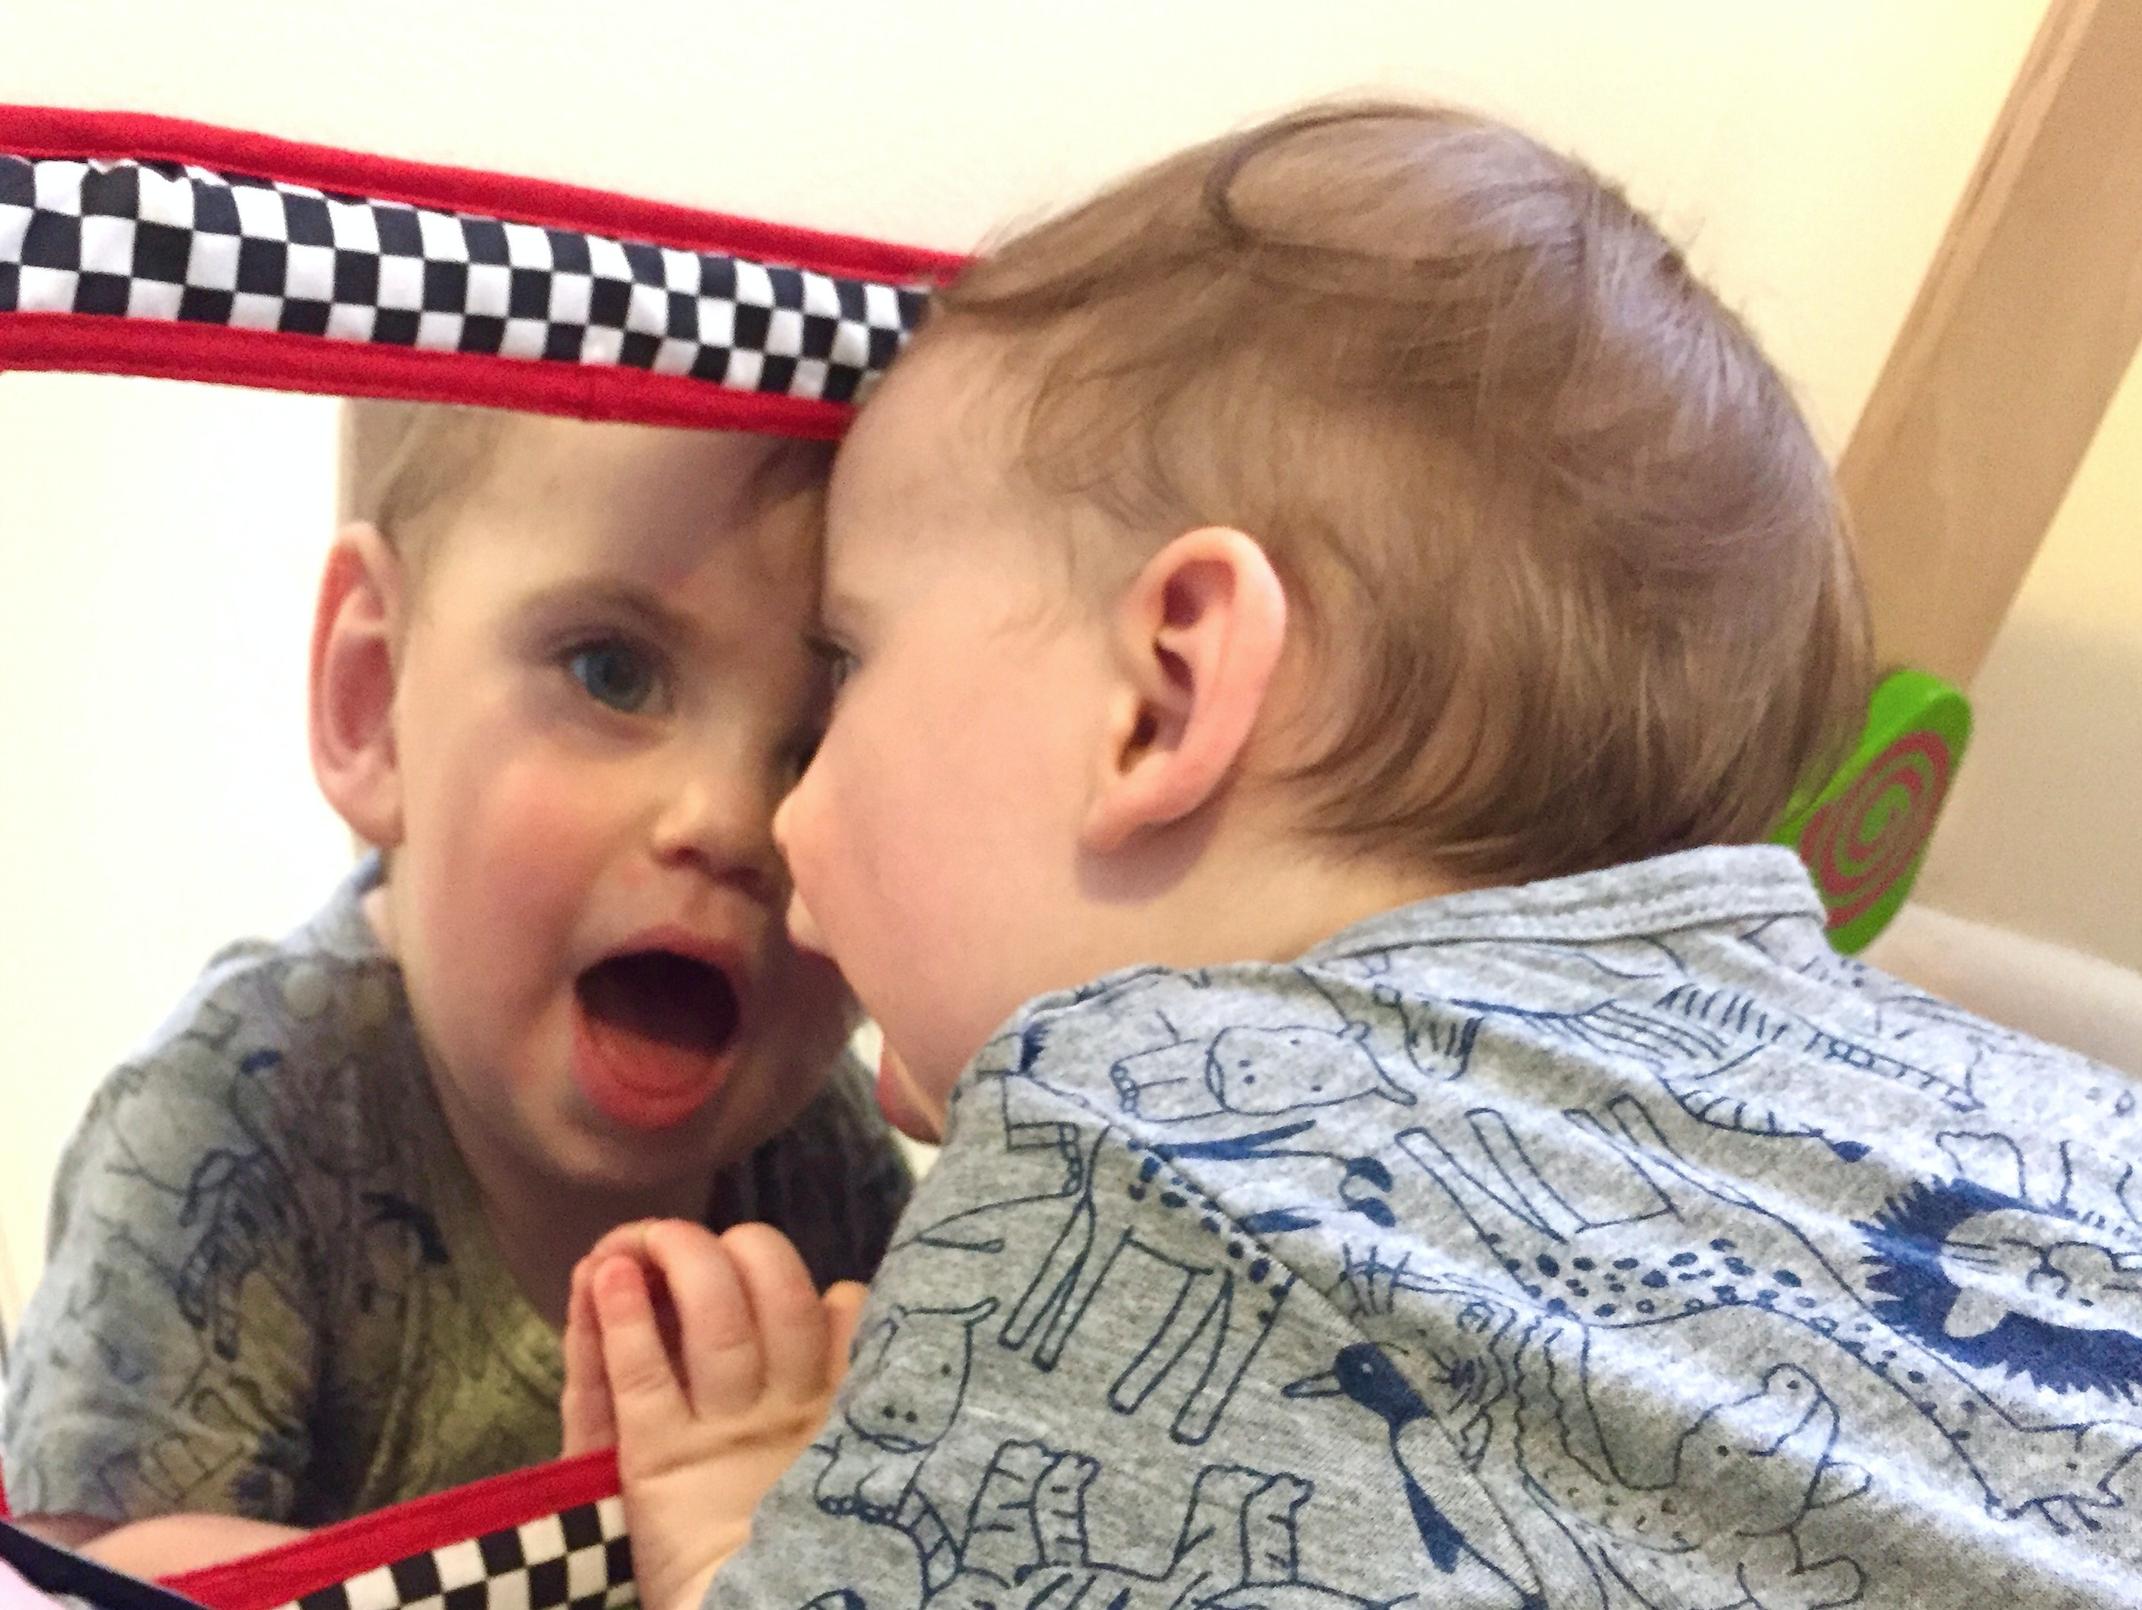 baby crib mirror in play-pen